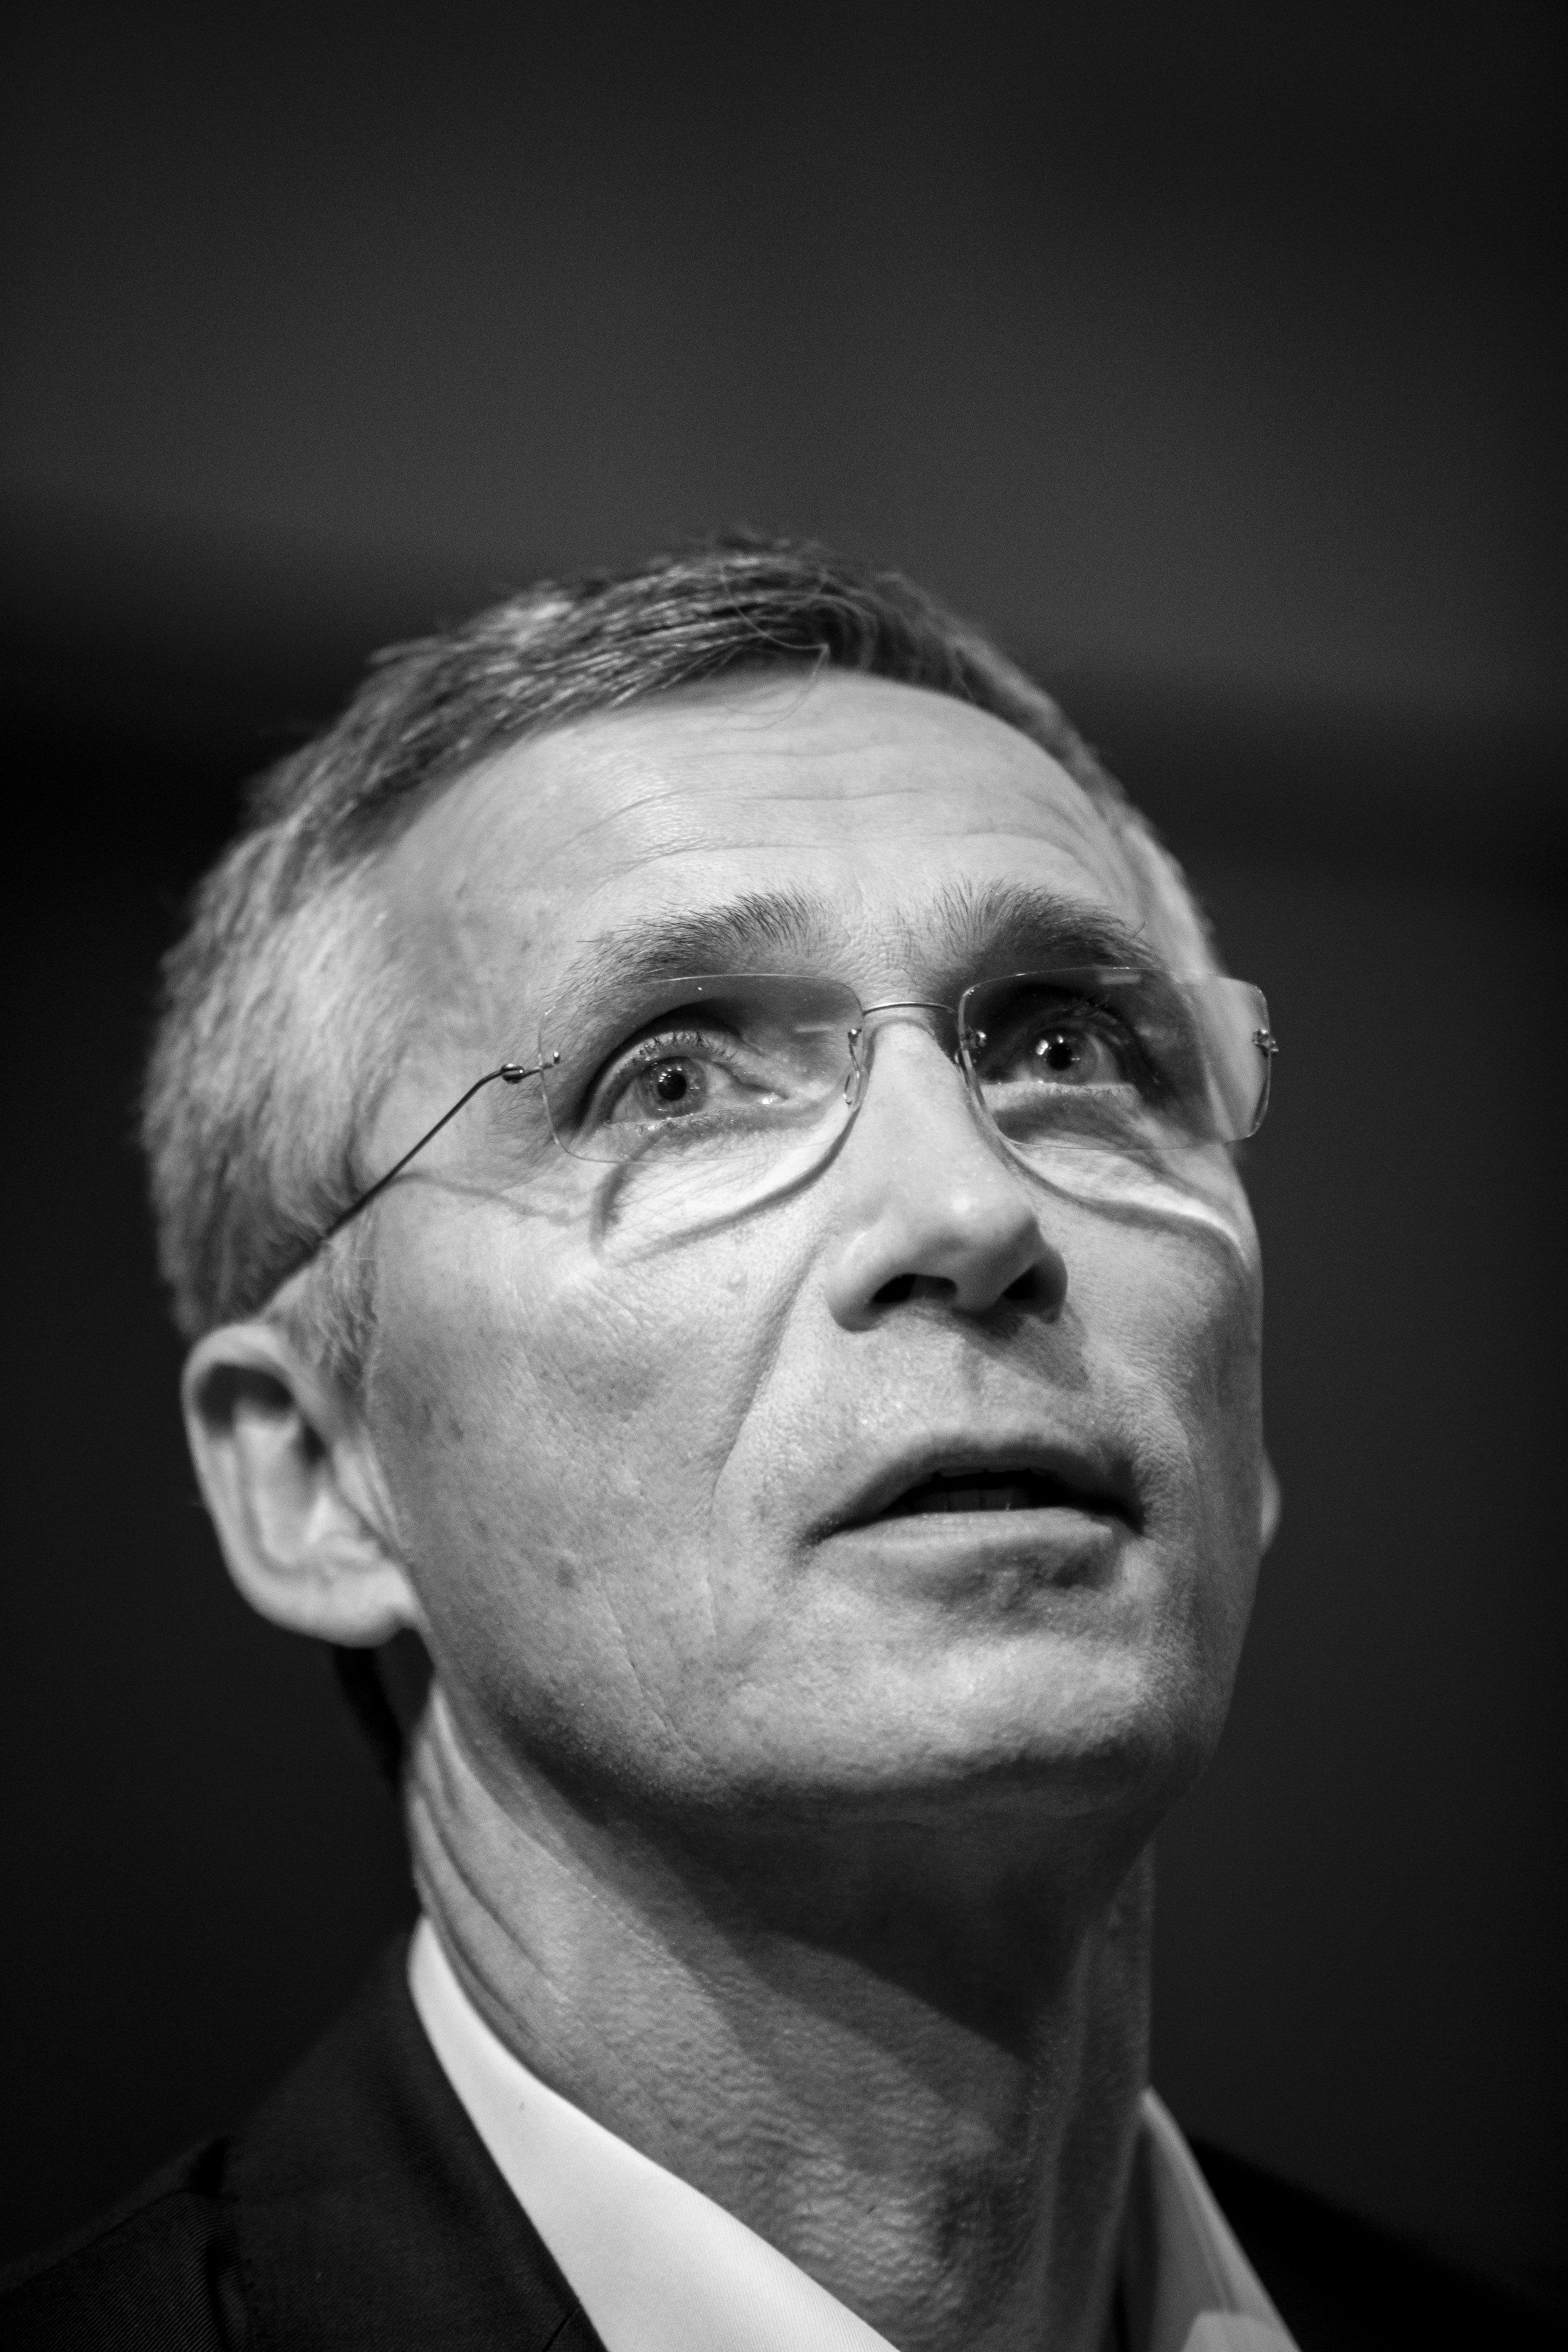 The Secretary General of NATO   Jens Stolenberg